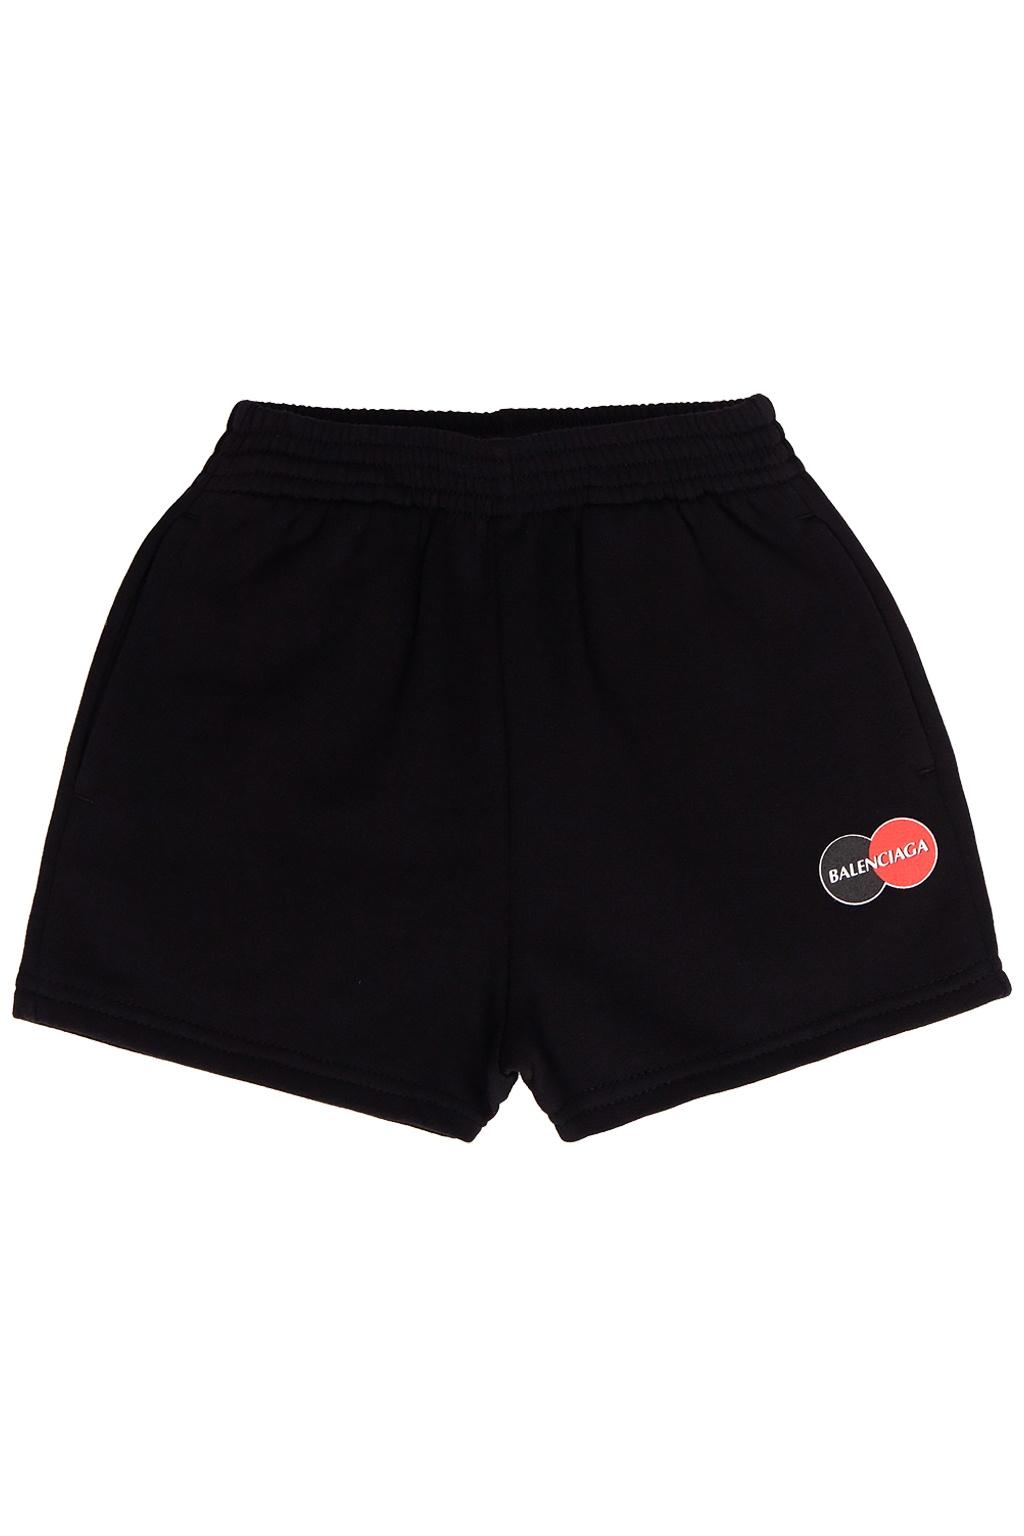 Balenciaga Kids 短裤